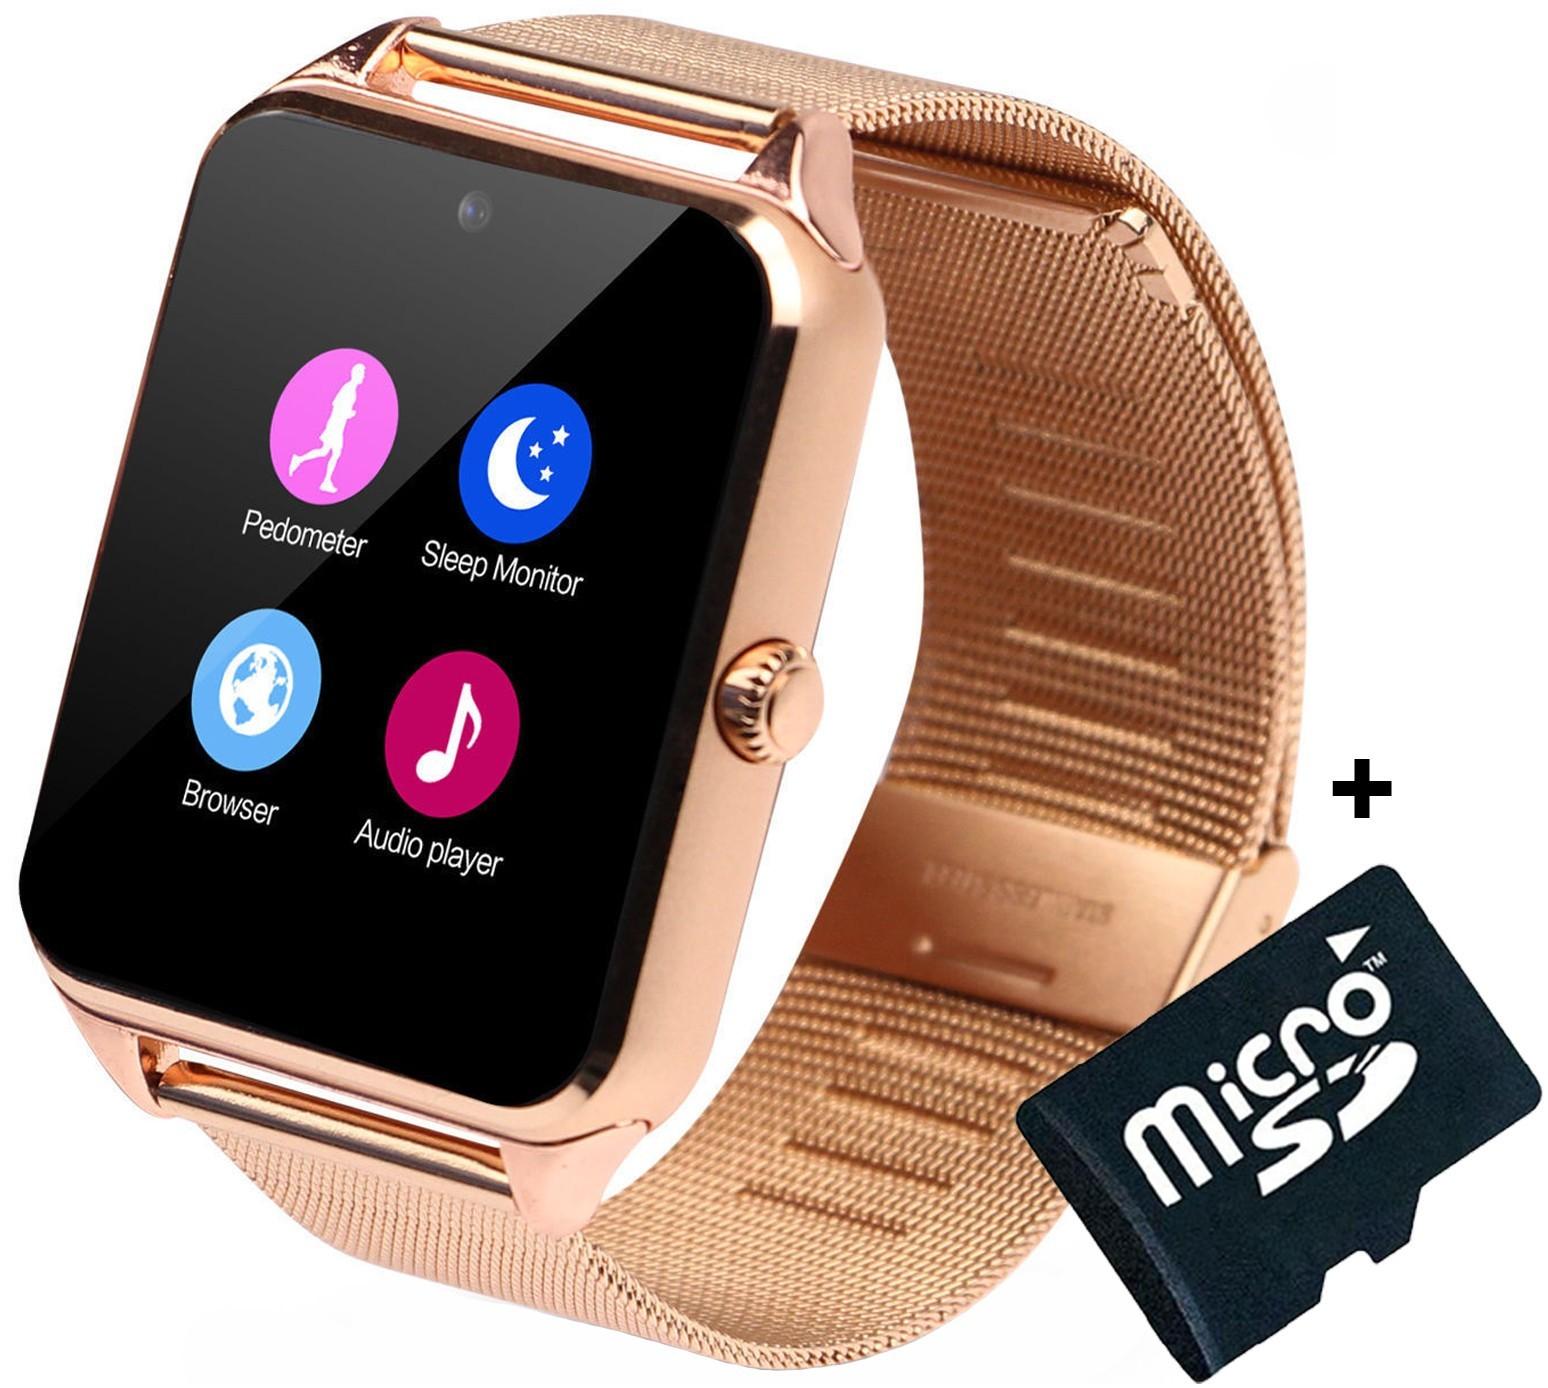 Ceas Smartwatch cu Telefon iUni Z60, Curea Metalica, Touchscreen, Camera, Gold + Card MicroSD 4GB imagine techstar.ro 2021